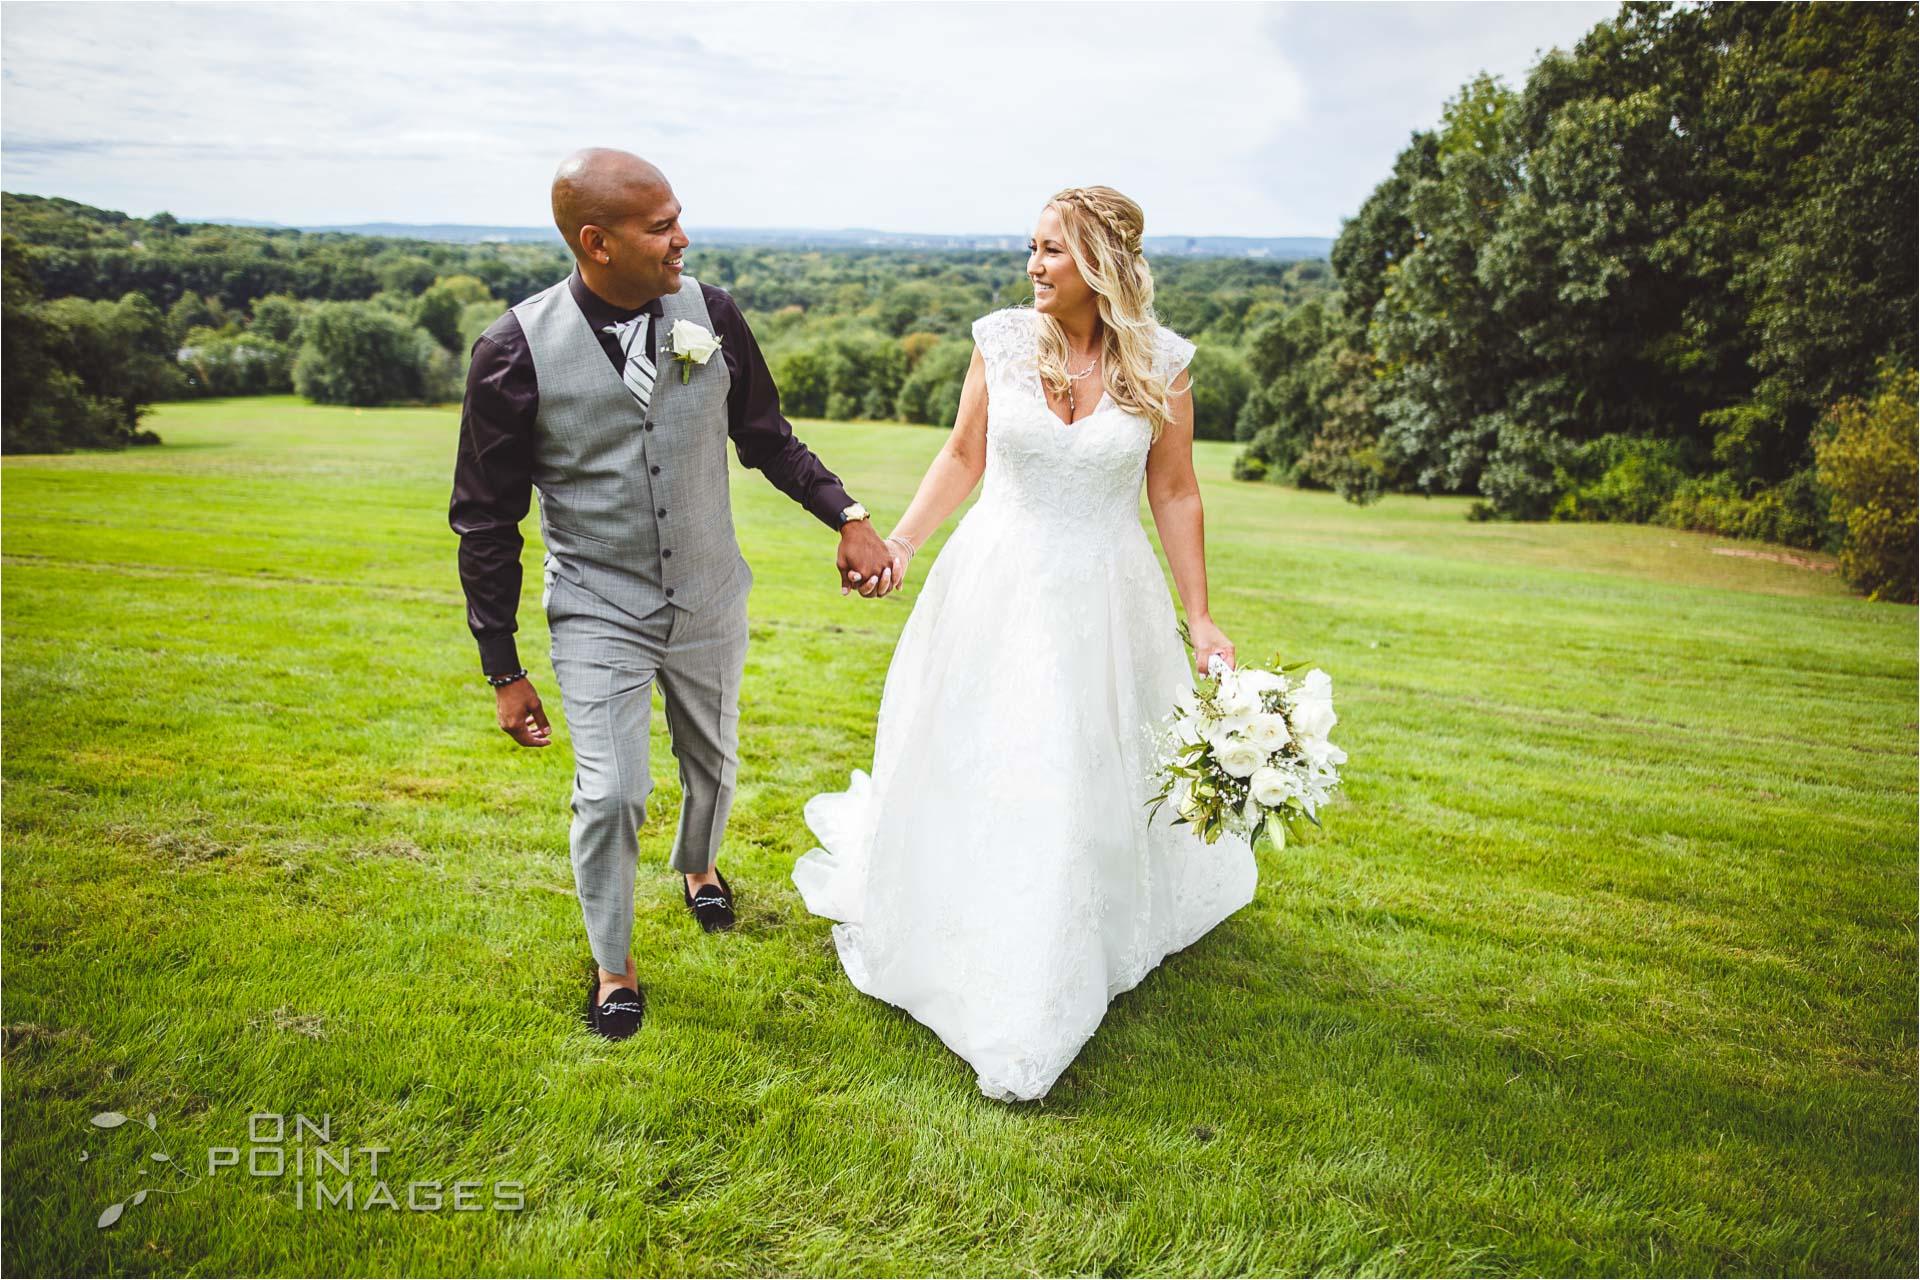 Wickham-Park-English-Garden-Wedding-Images-01.jpg